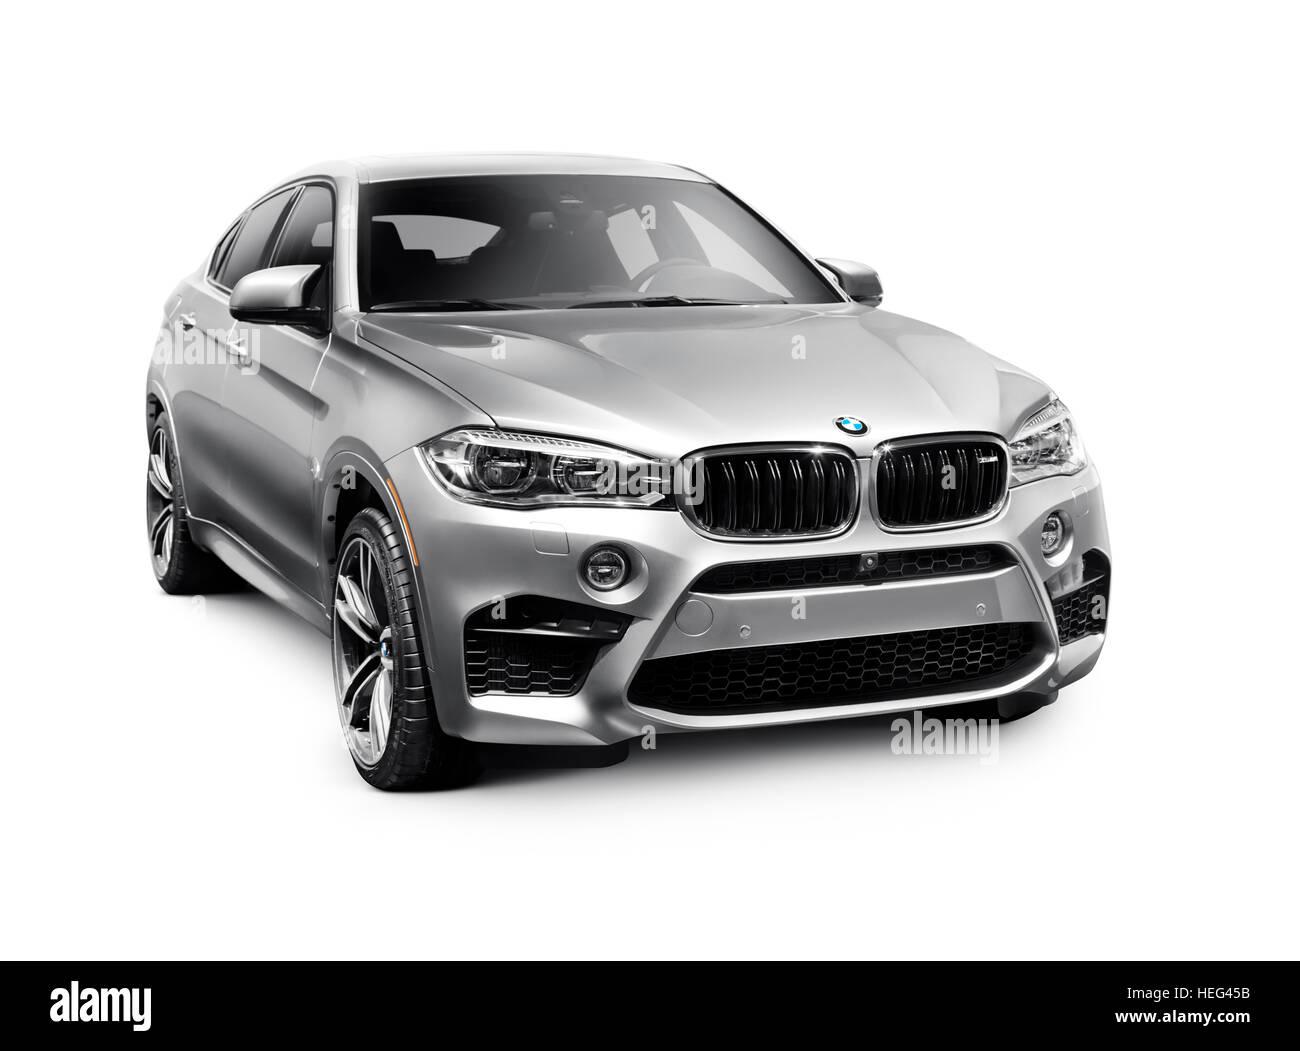 Silver 2016 BMW X6 M crossover SUV, luxury car - Stock Image